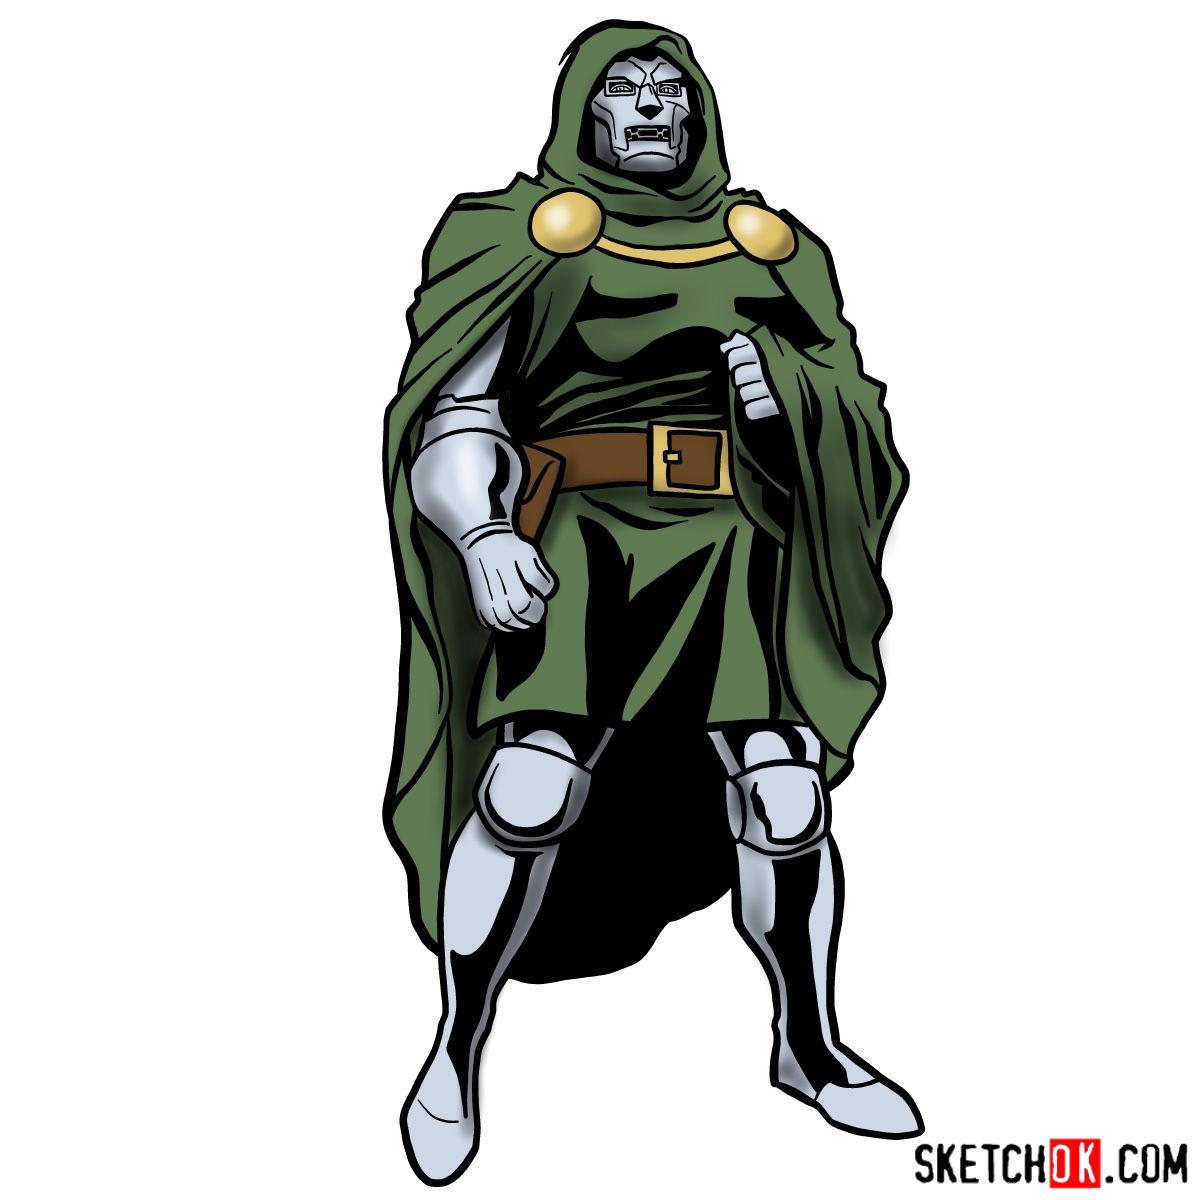 1200x1200 How To Draw Doctor Doom, Marvel's Supervillian